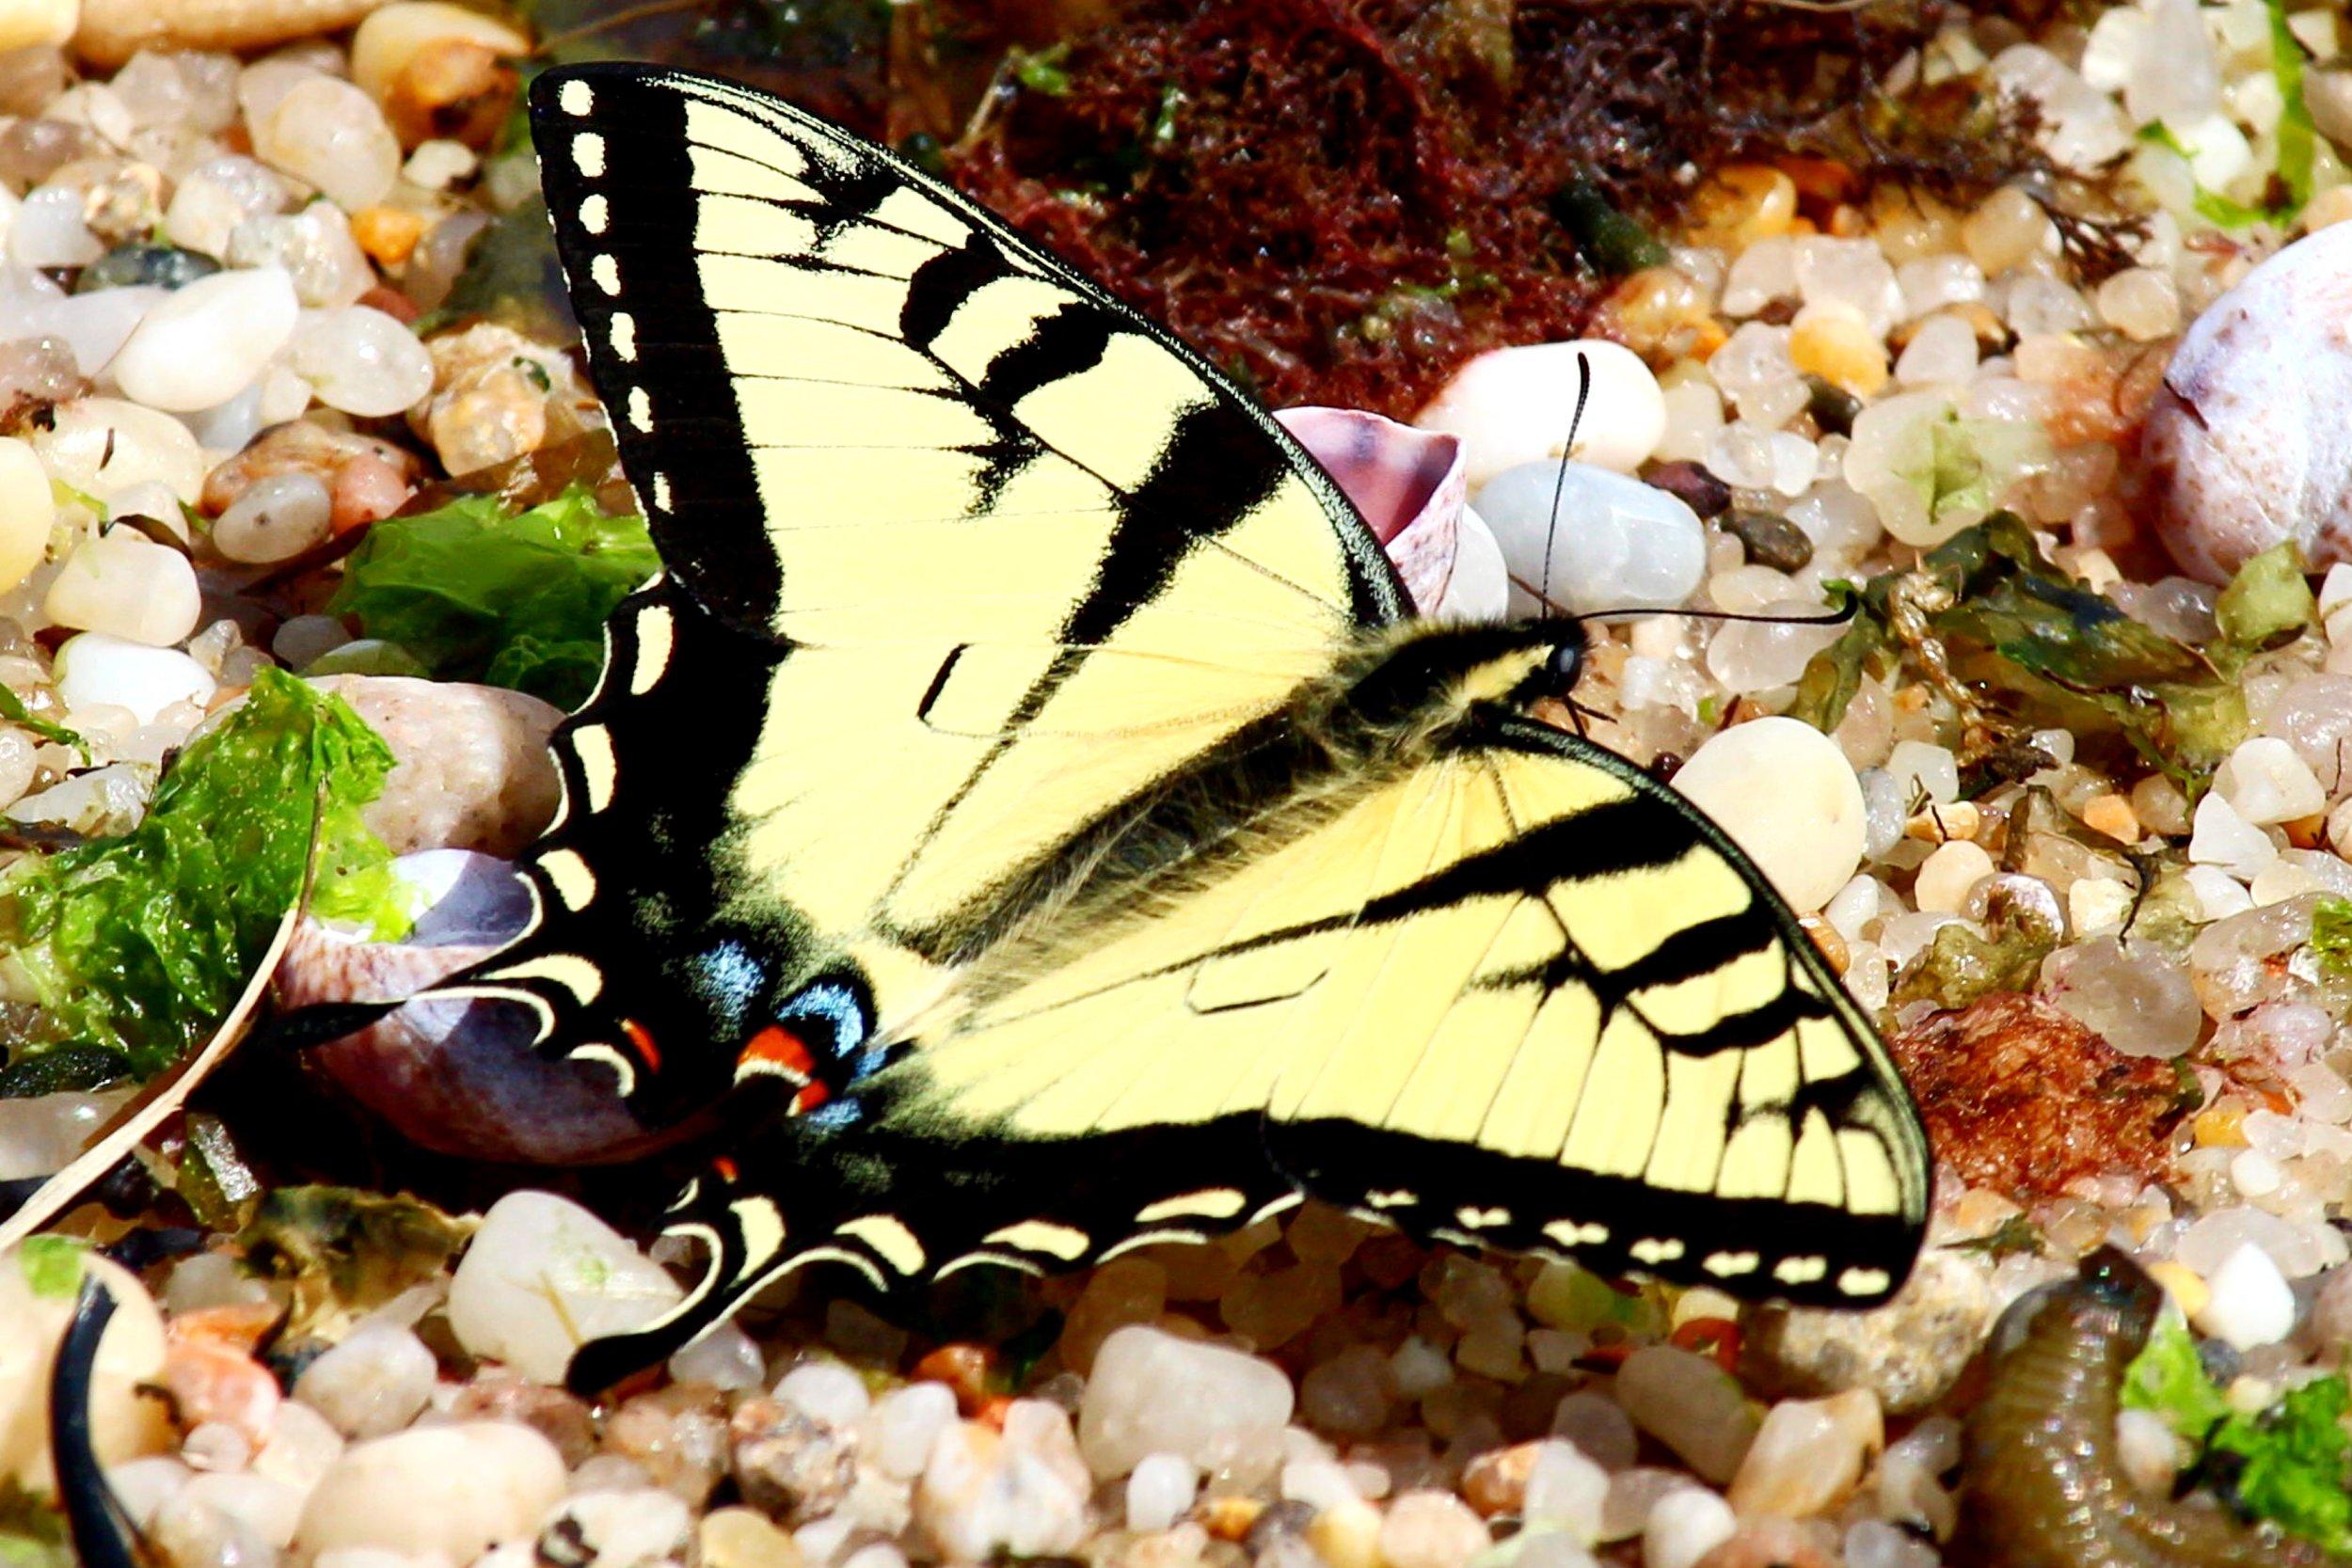 Eastern Tiger Swallowtail (Wildwood State Park)